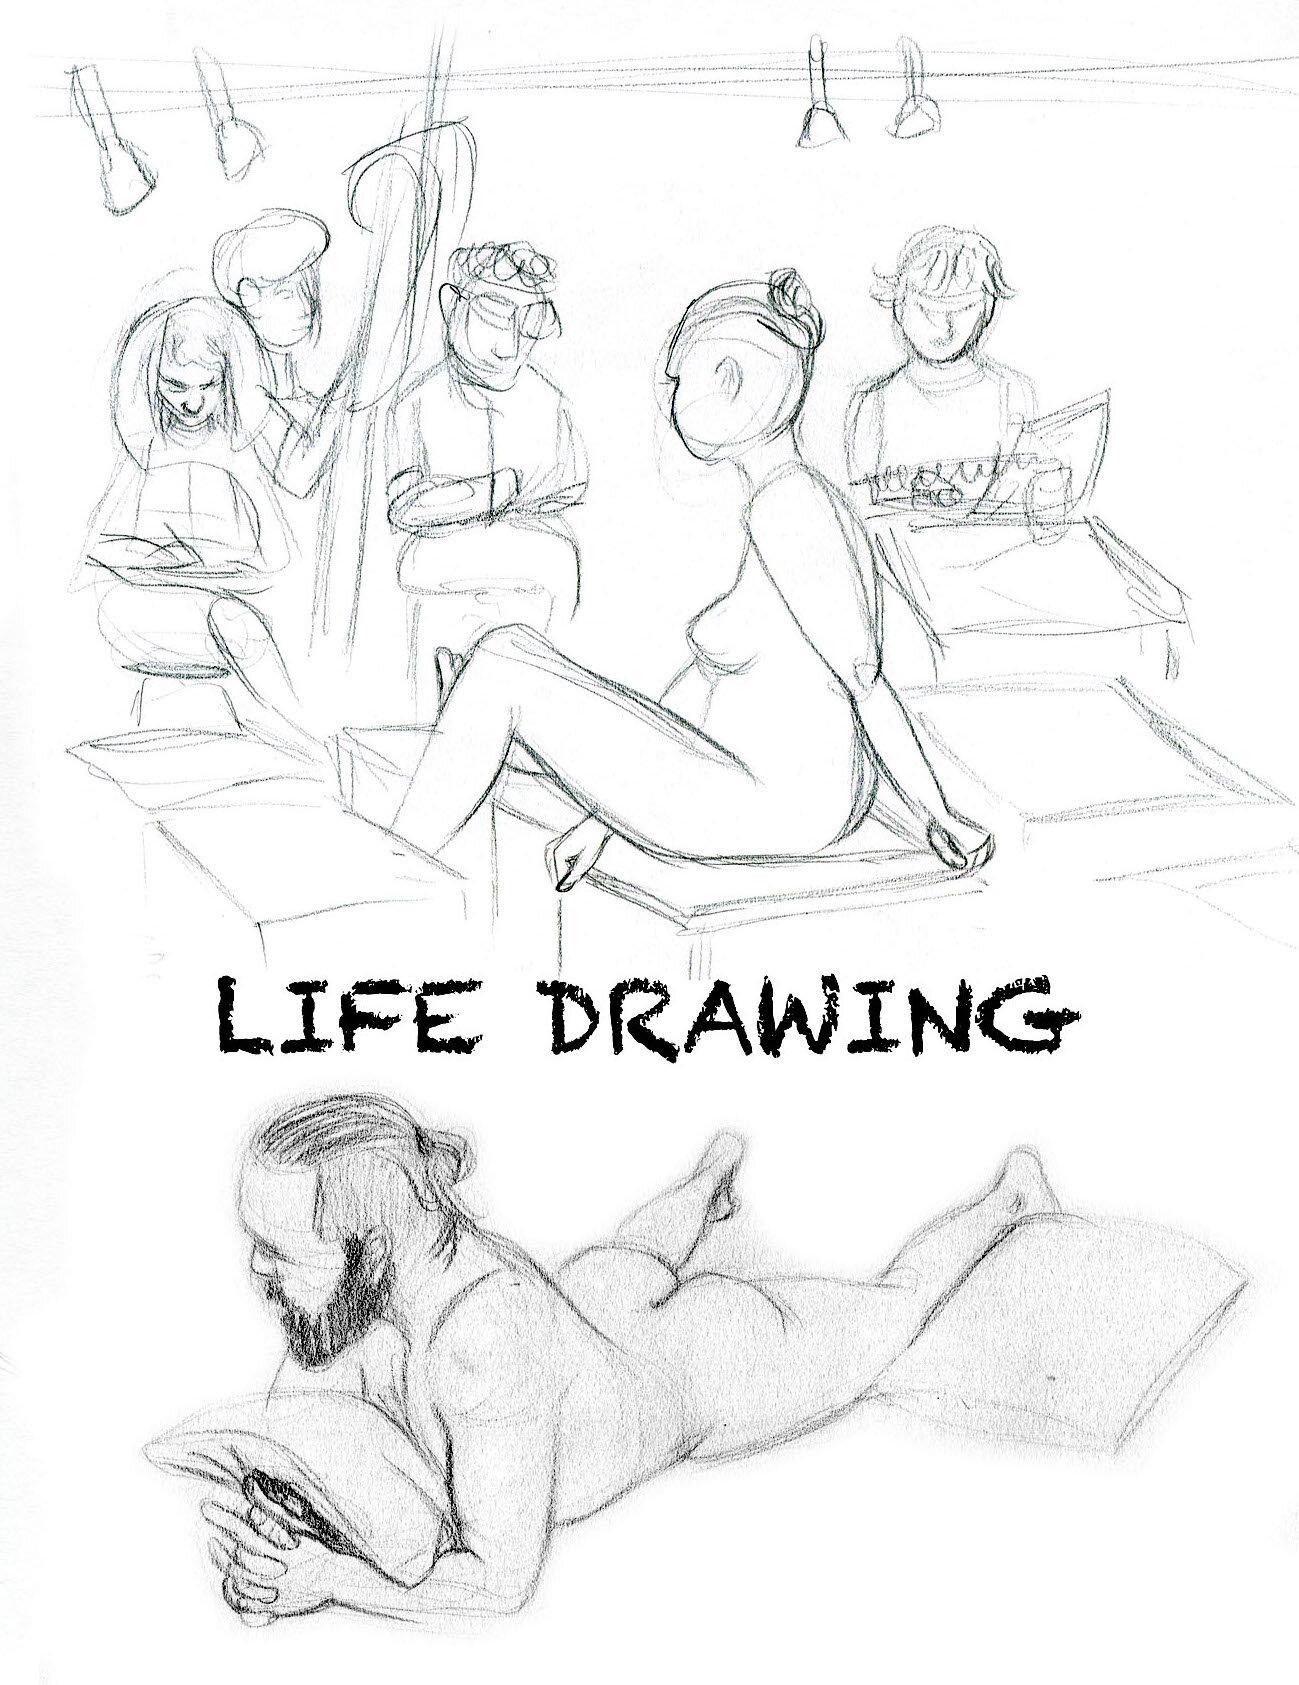 Life Drawing Pencil copy.jpg